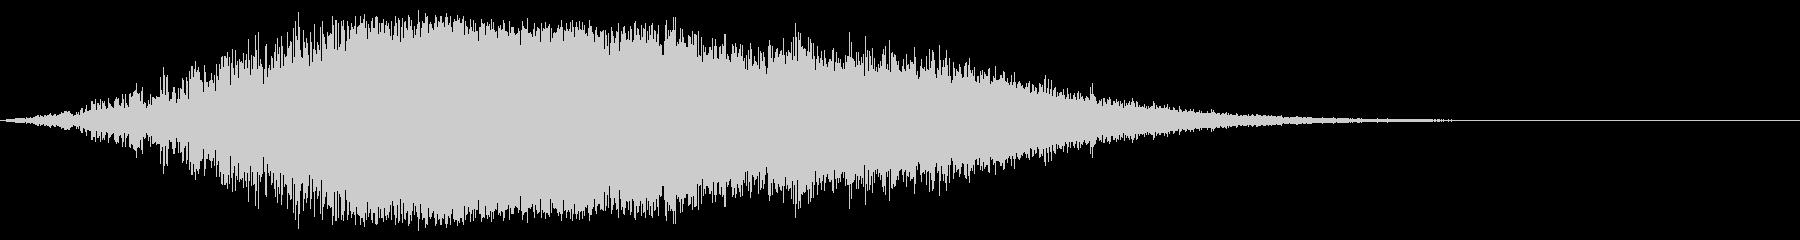 SciFi EC03_97_2の未再生の波形